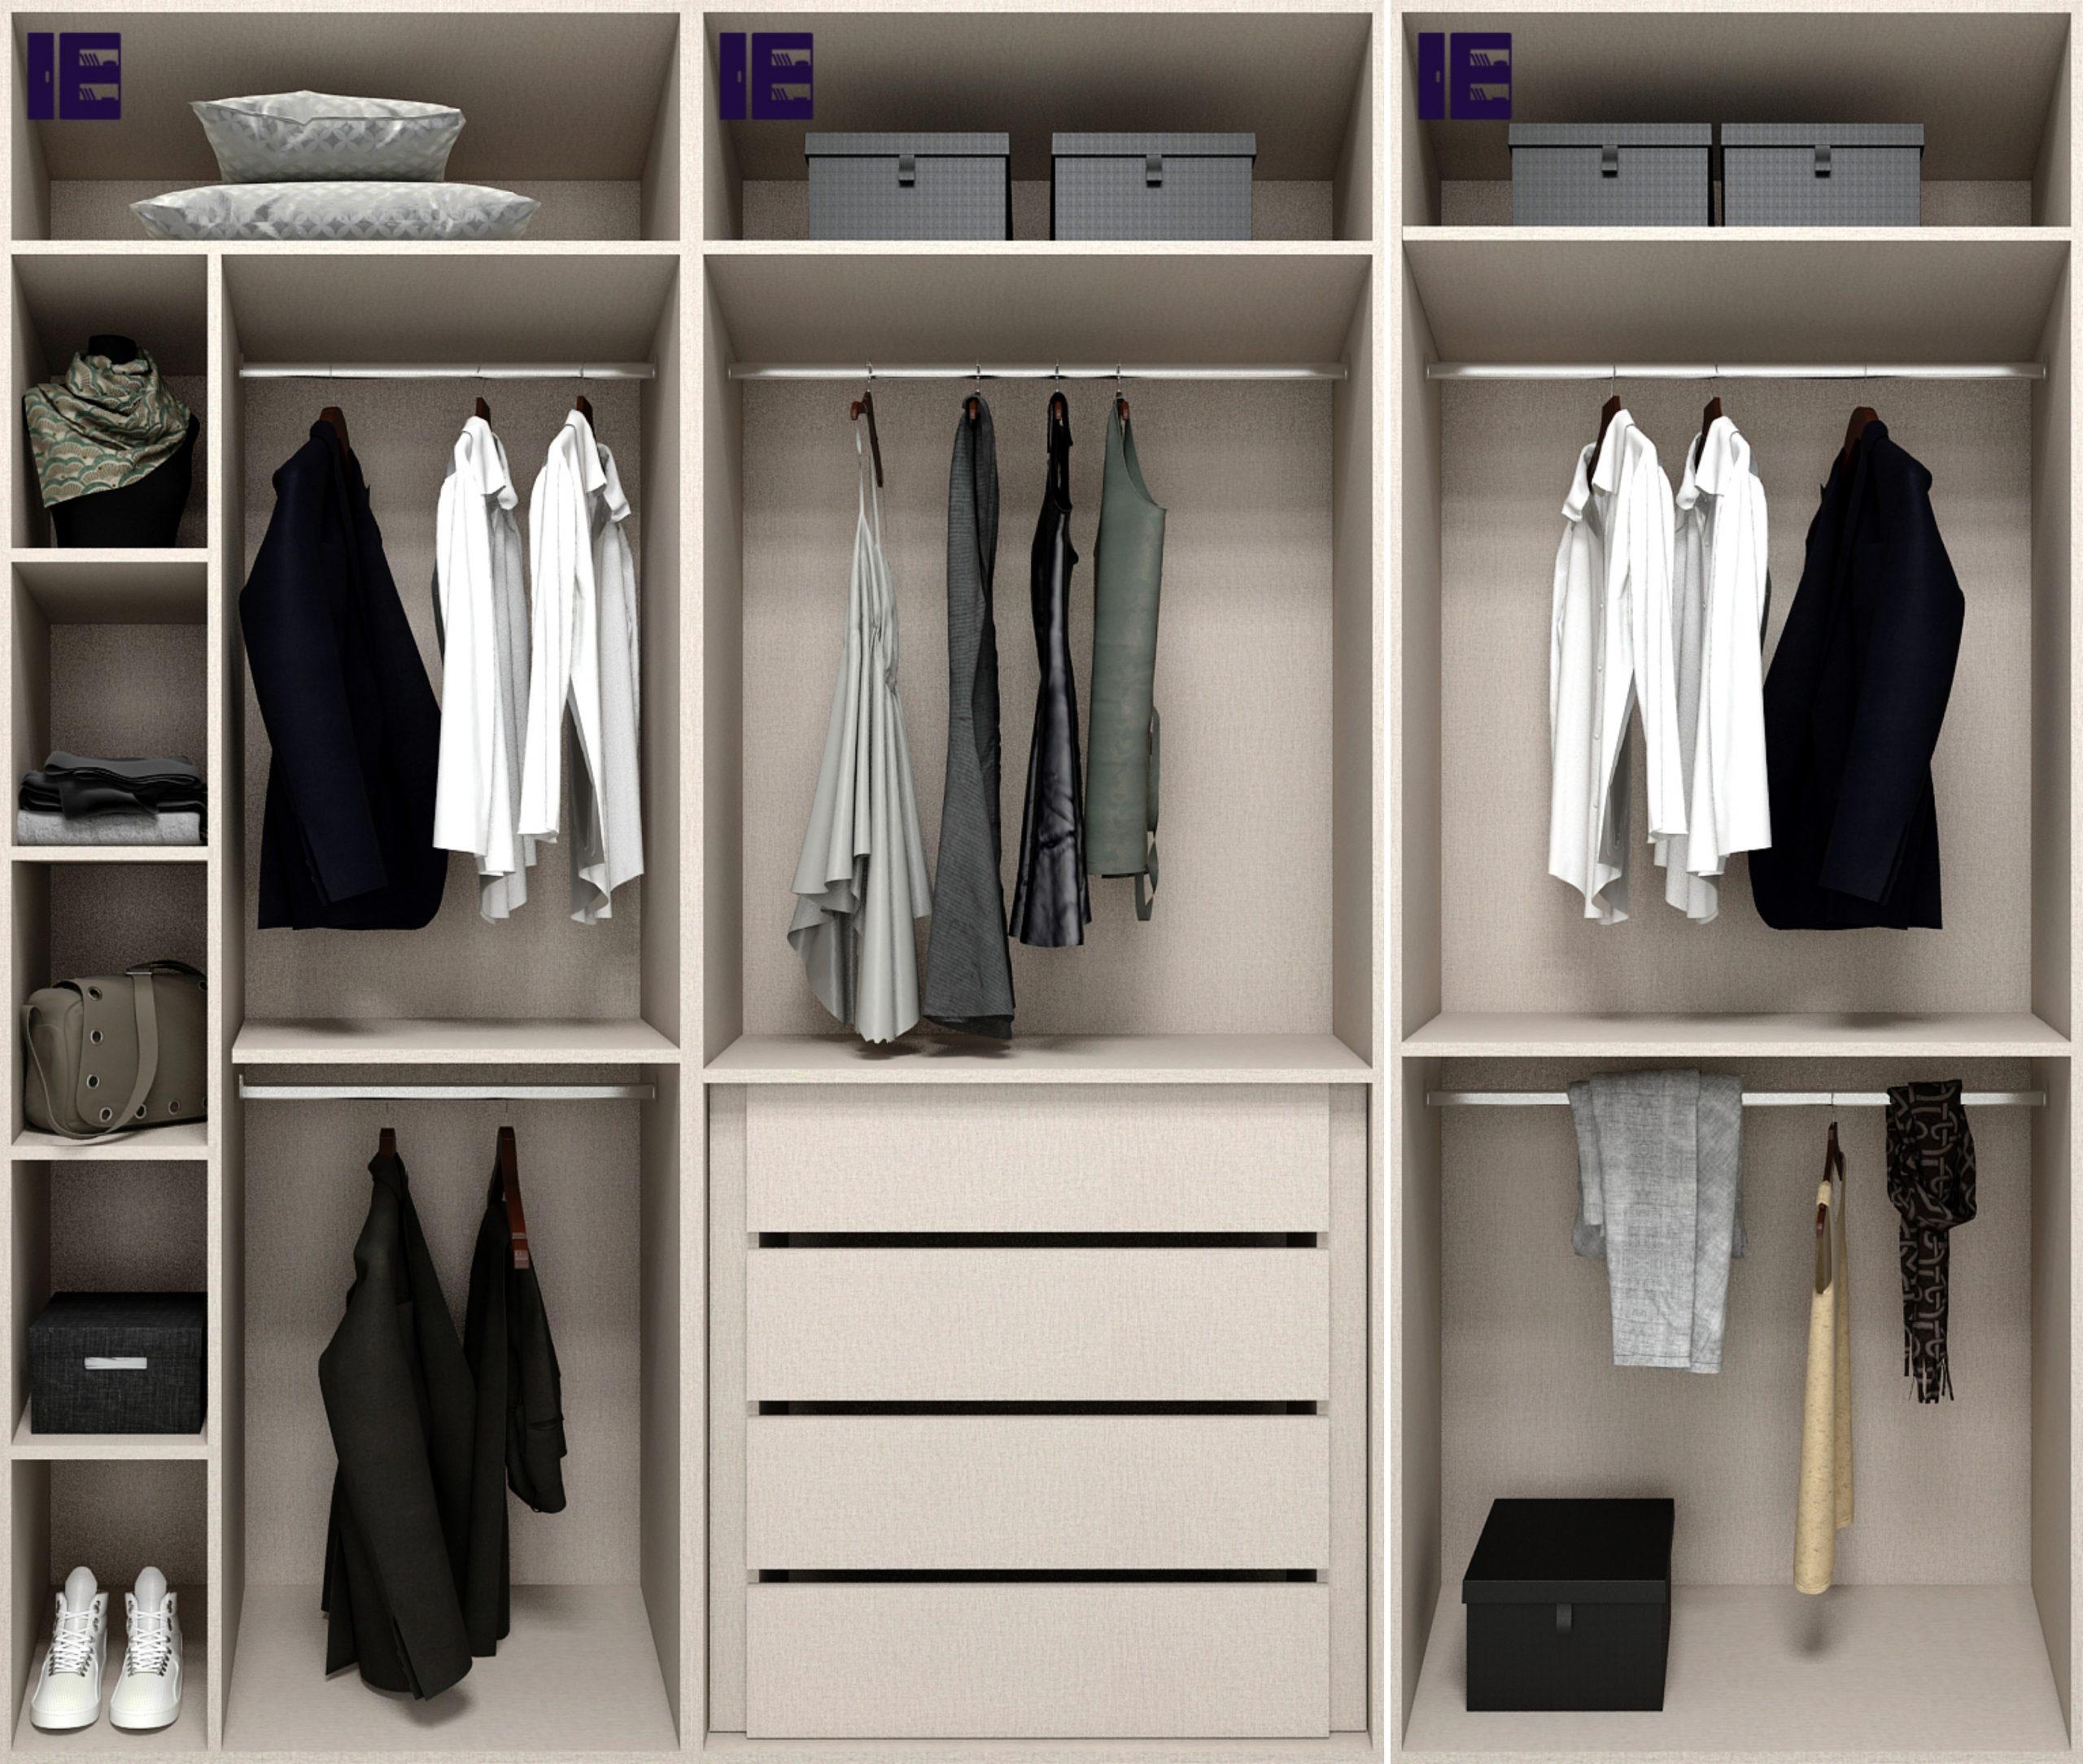 Wardrobe Internals for 3m Wardrobe